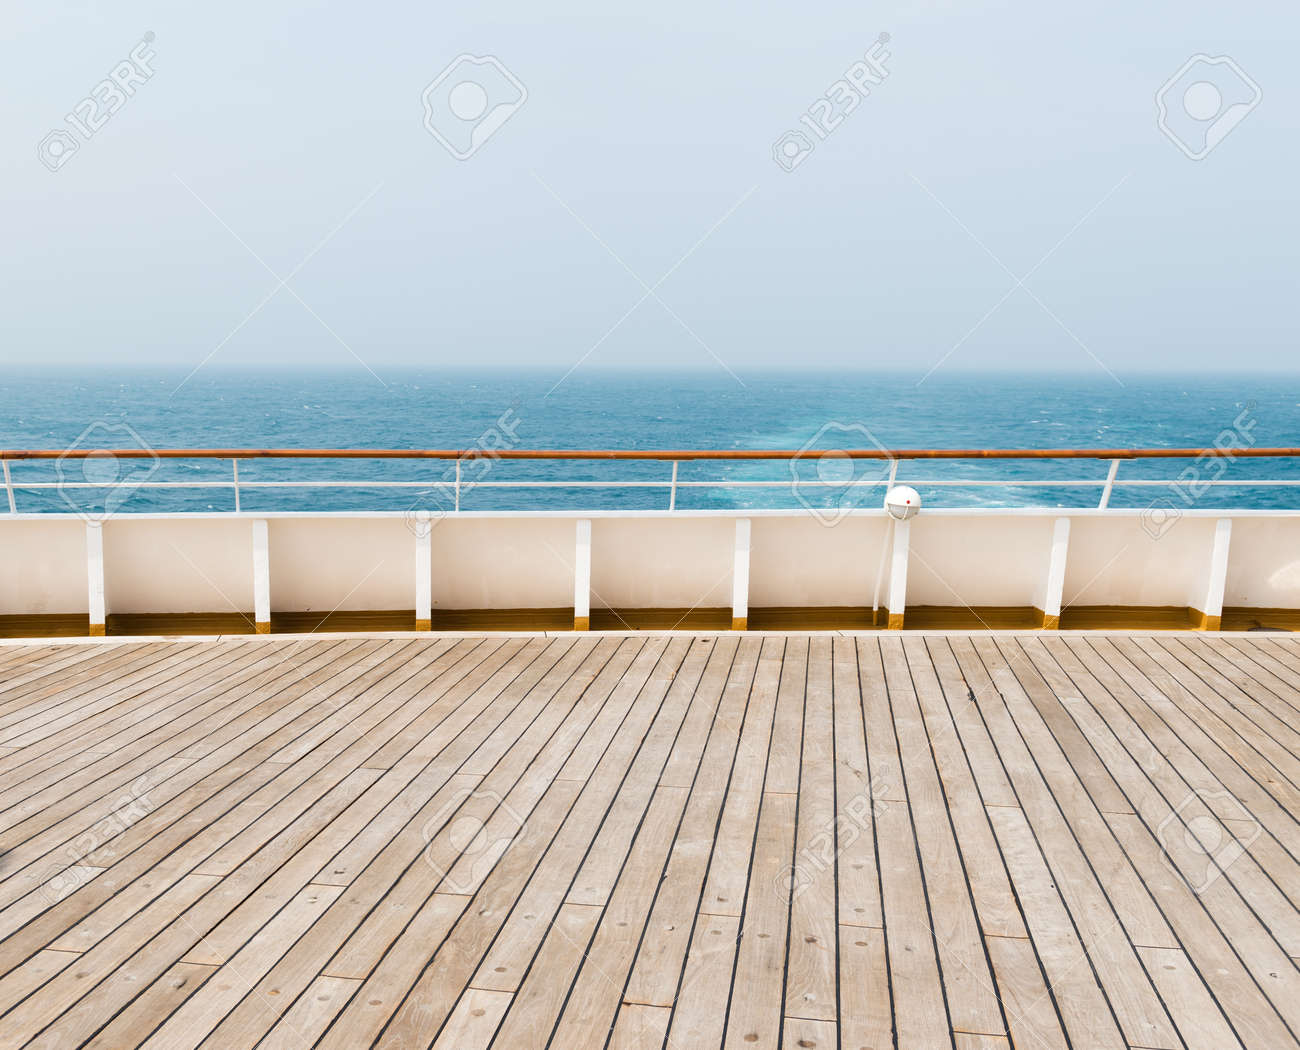 deck of luxury cruise ship Stock Photo - 35235327